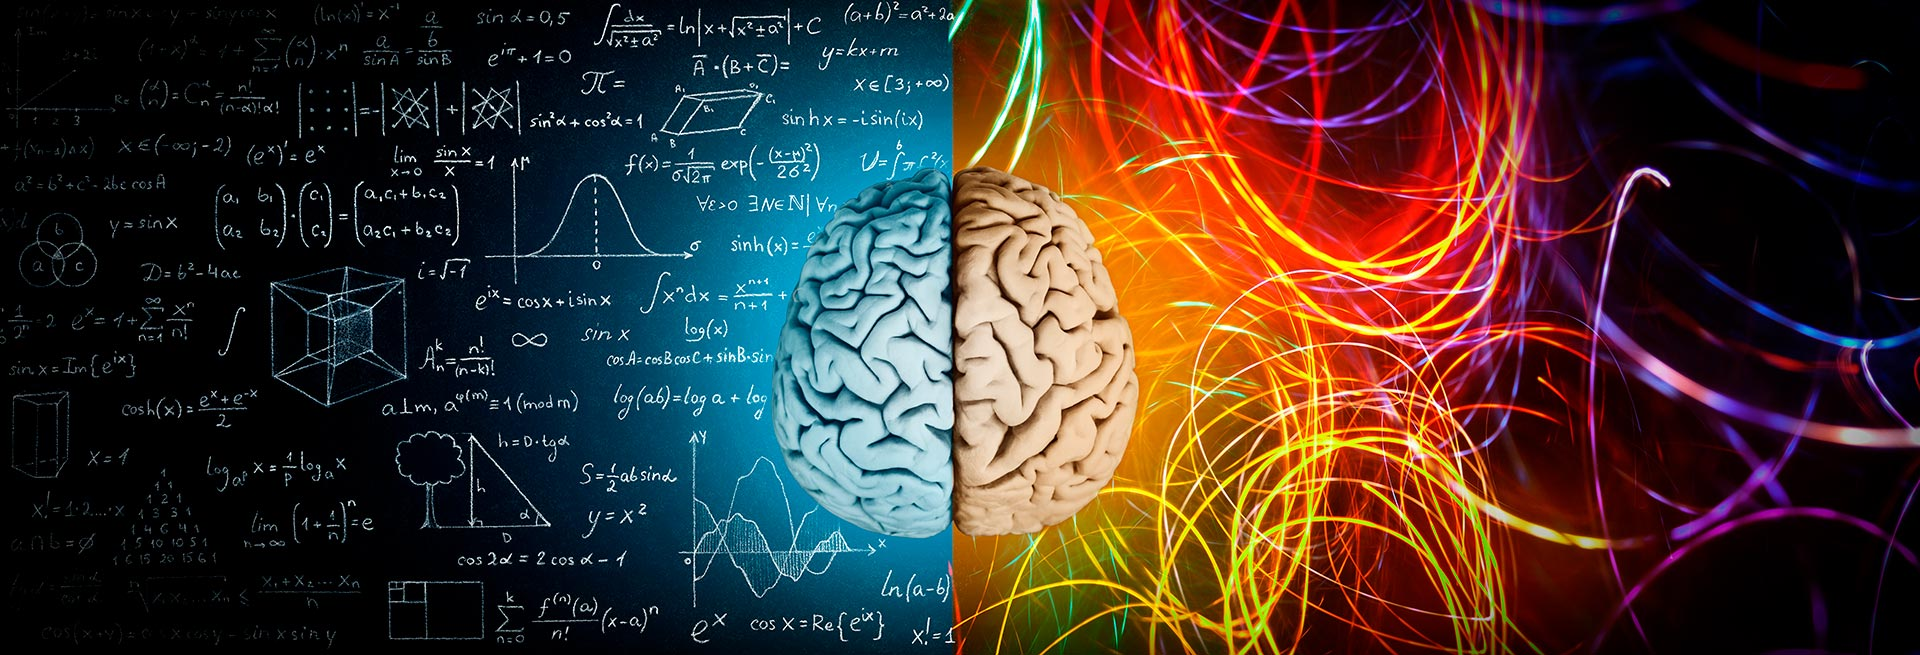 dynamical-neurofeedback-pornic-optimisation-des-capacites-cognitives